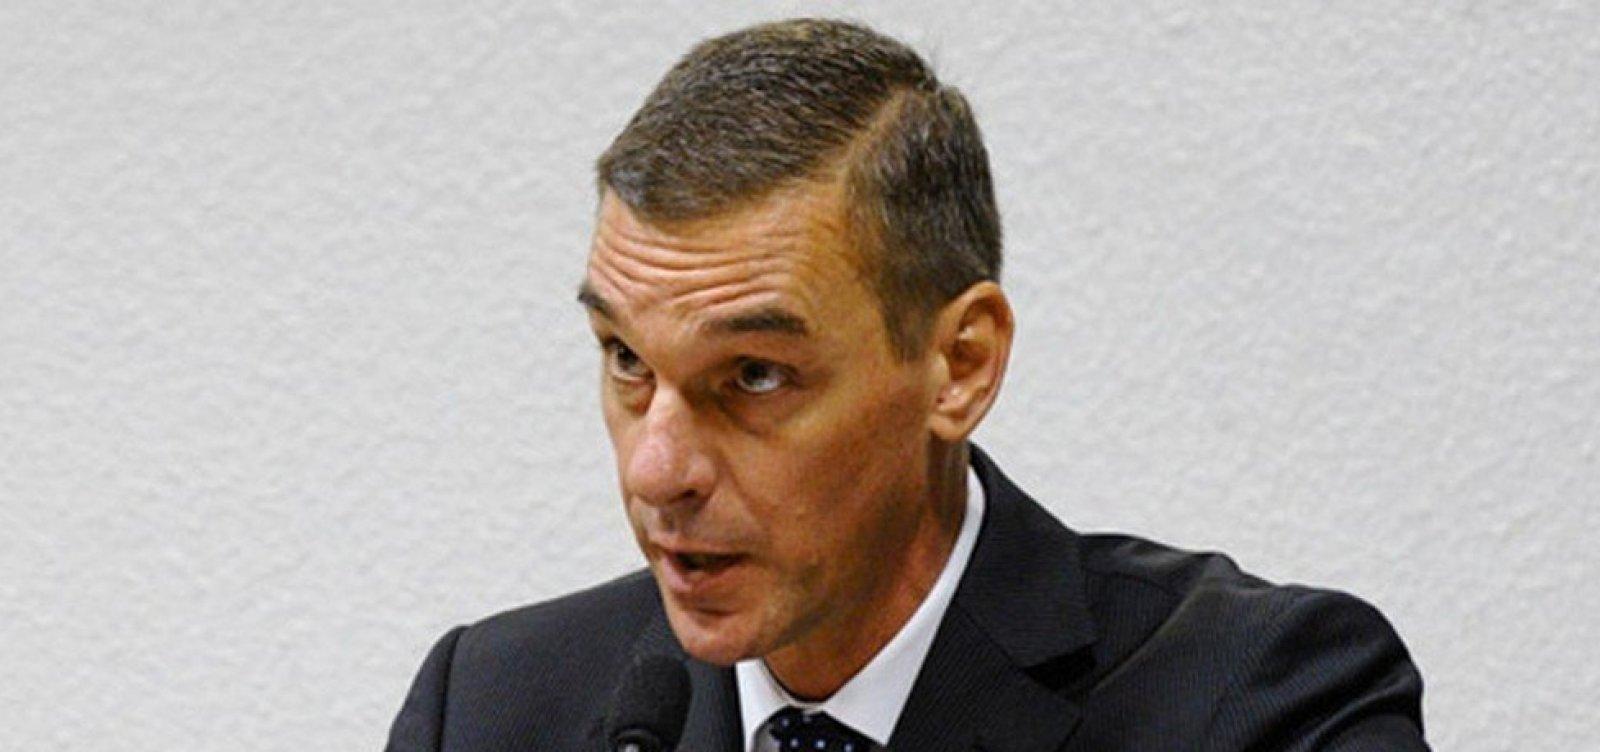 [Executivo do HSBC é escolhido para presidência do Banco do Brasil]